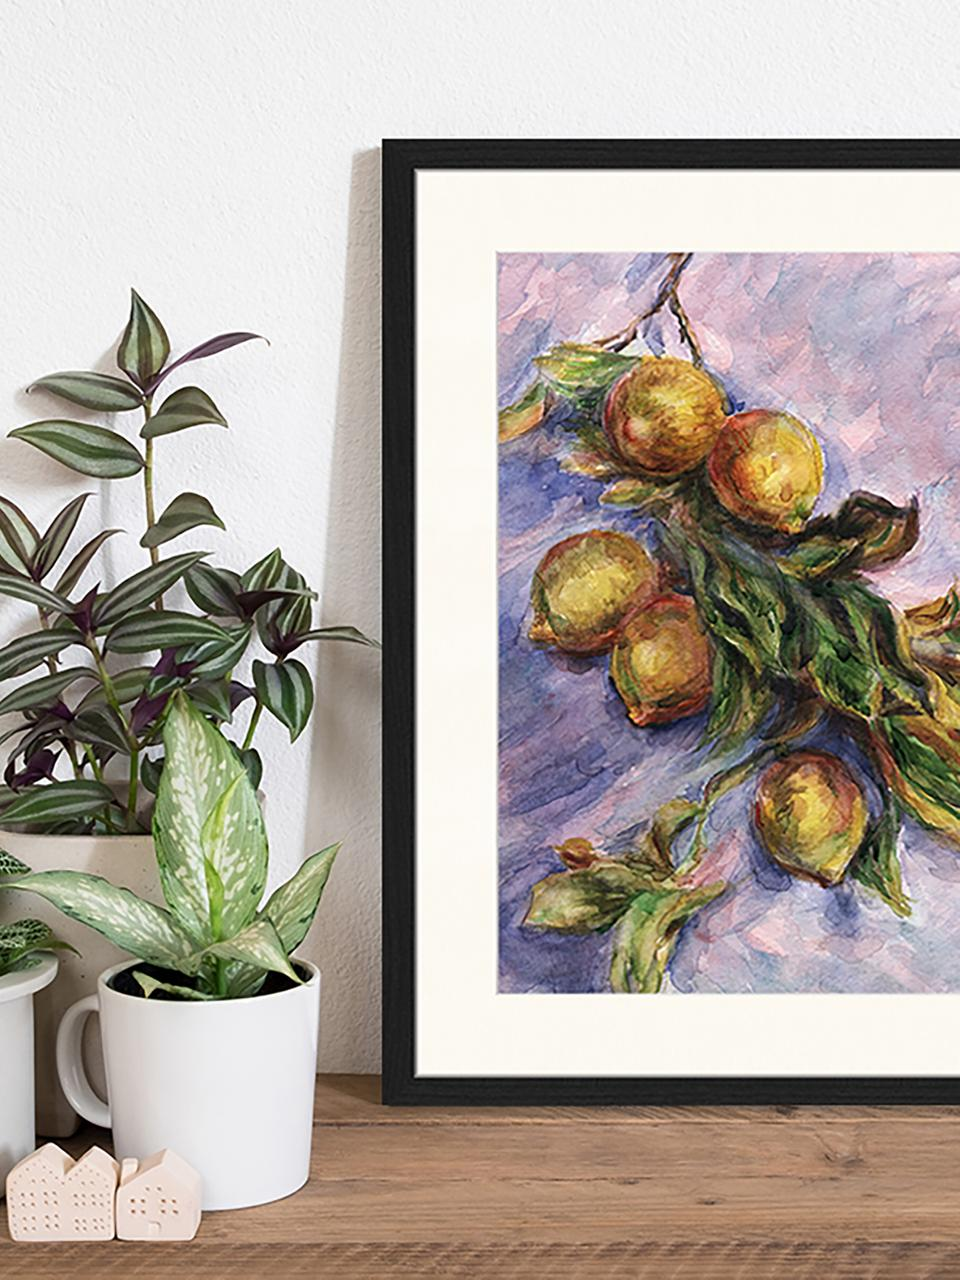 Gerahmter Digitaldruck Lemons On A Branch, Bild: Digitaldruck auf Papier, , Rahmen: Holz, lackiert, Front: Plexiglas, Mehrfarbig, 43 x 53 cm